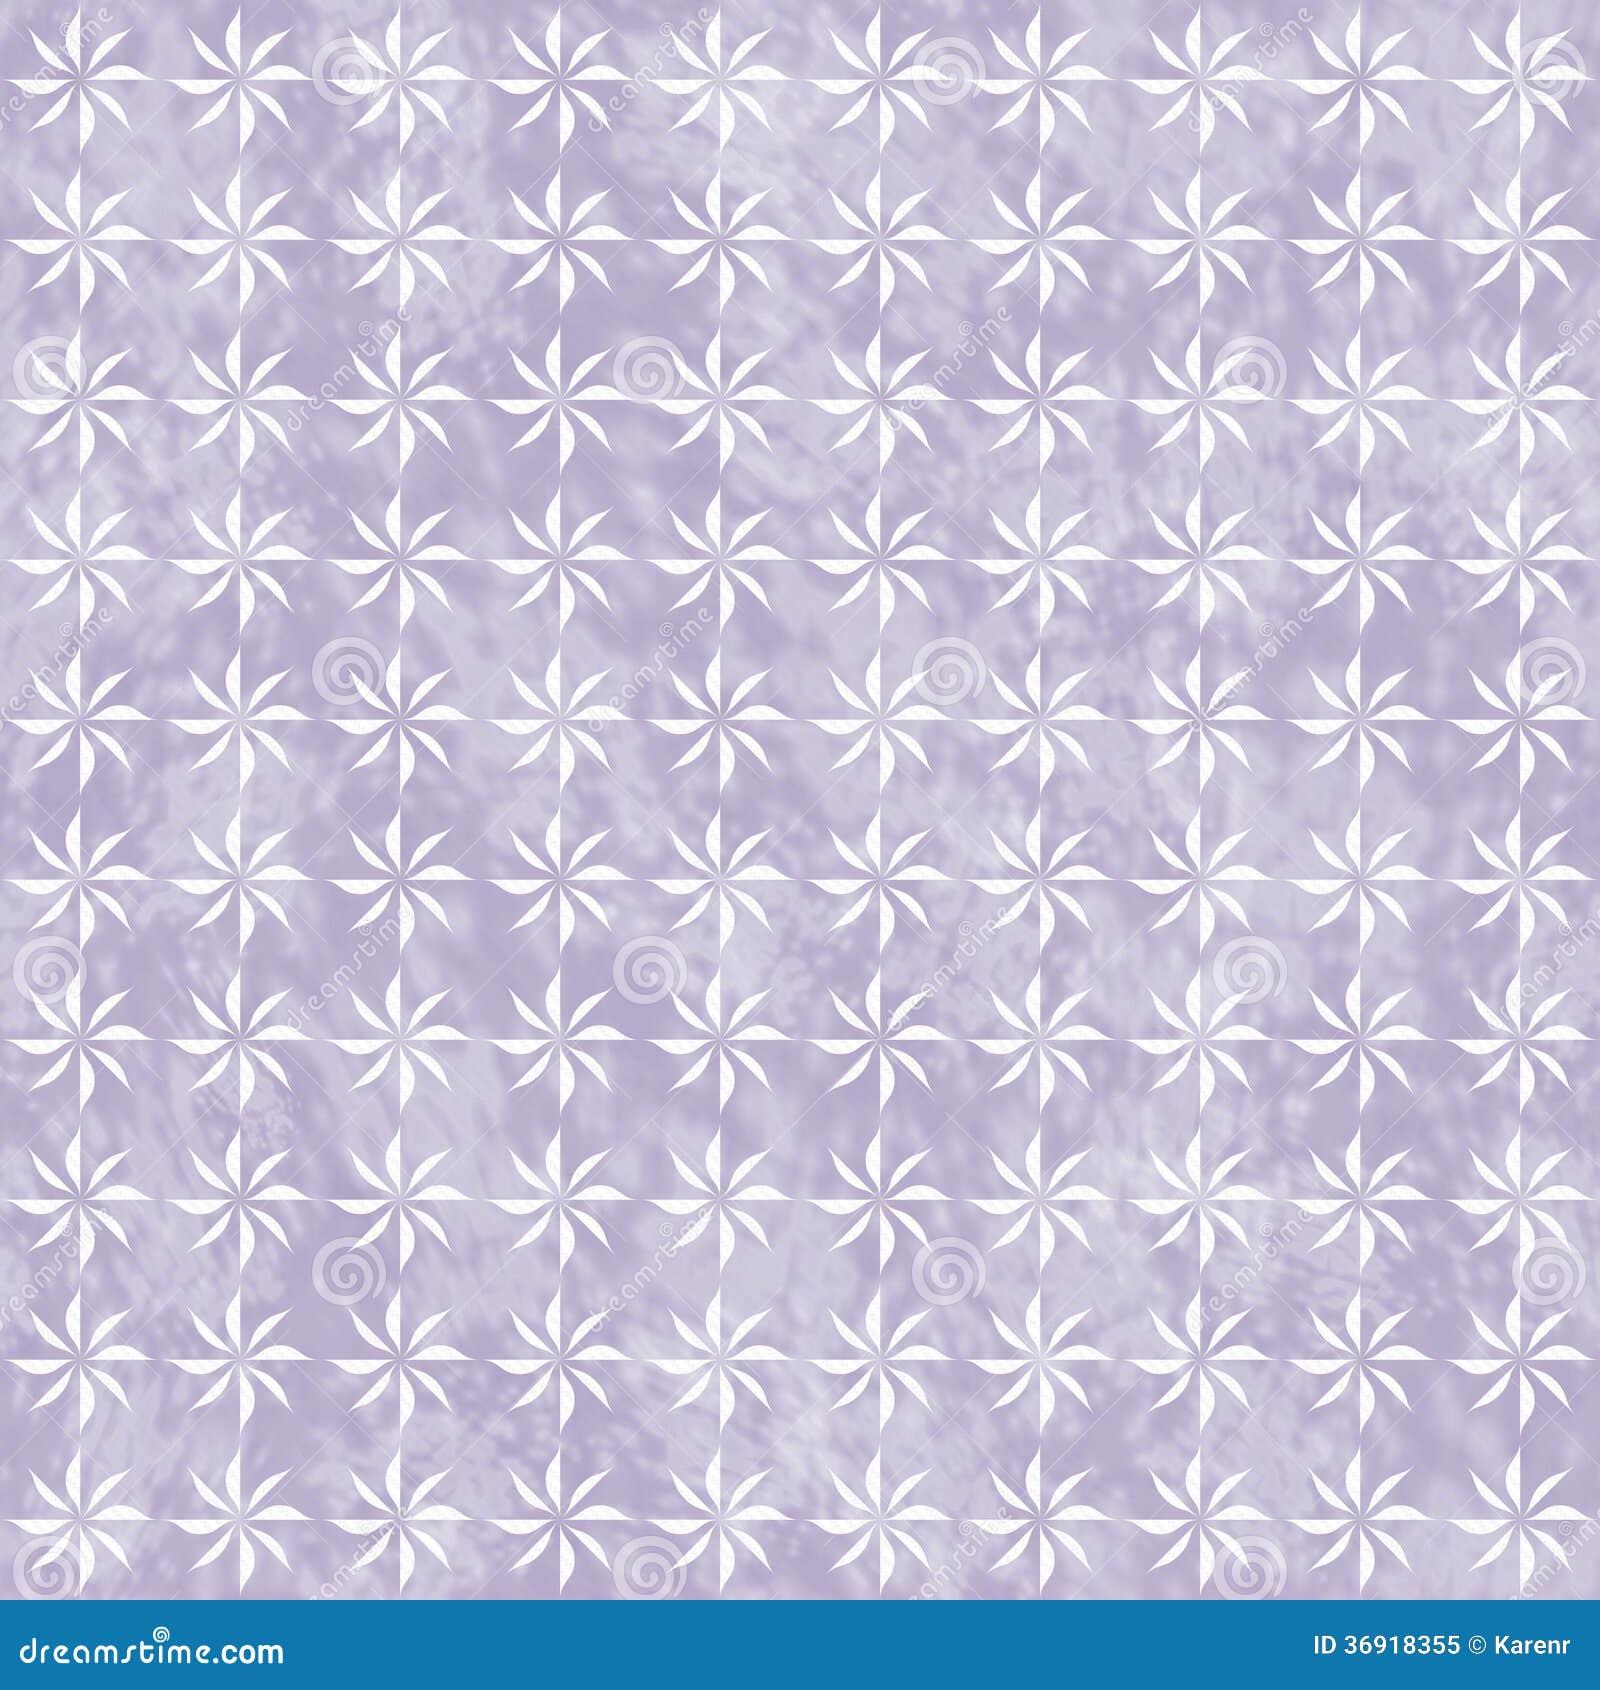 Purple and White Decorative Swirl Design Textured Fabric Backgro